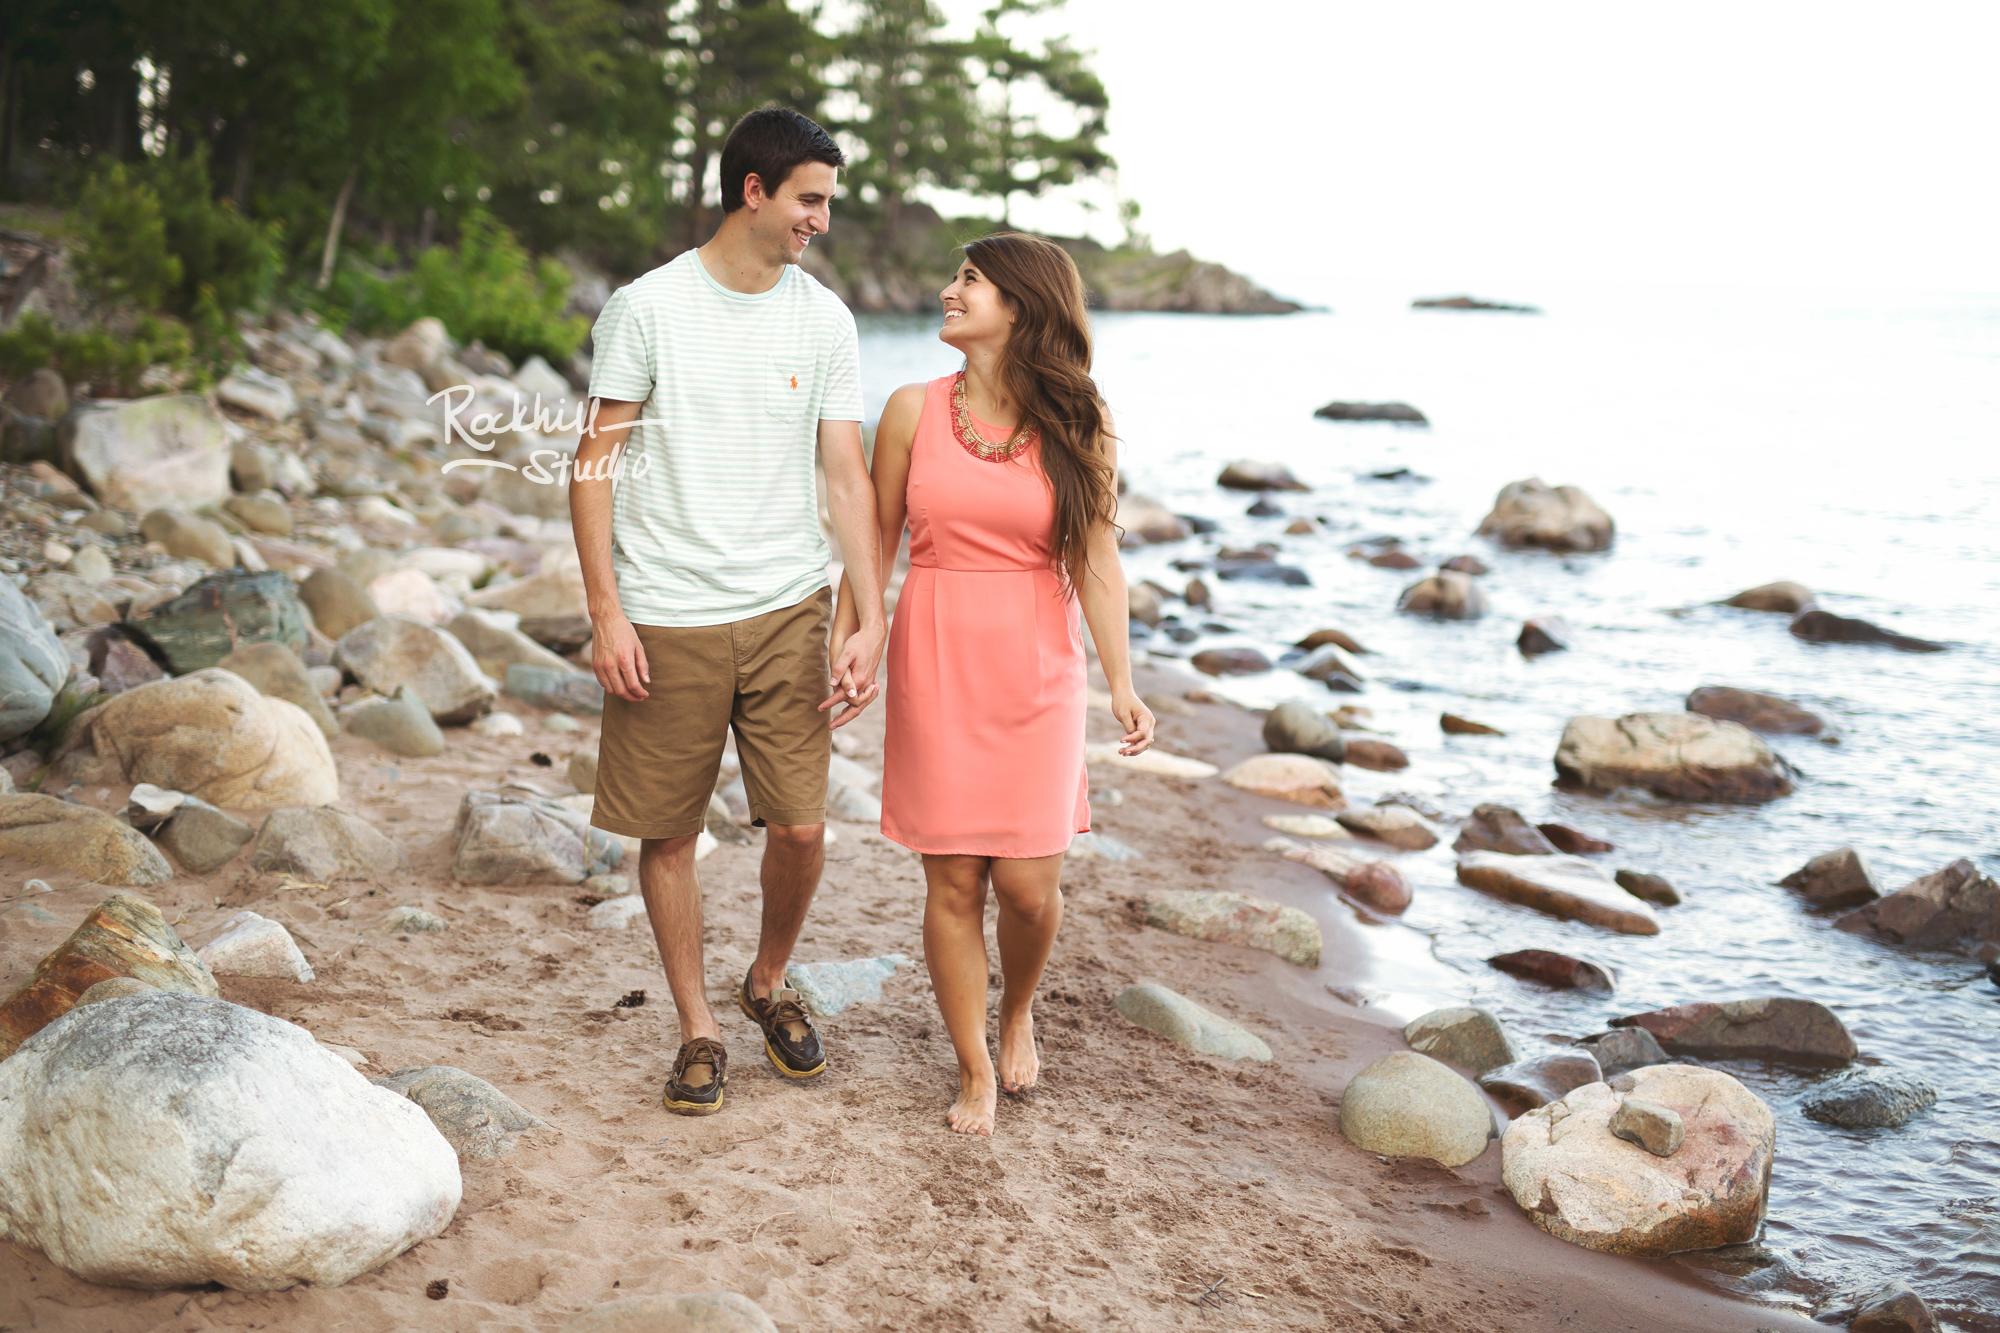 rockhill-studio-marquette-michigan-upper-peninsula-engagement-photographer-wetmore-landing-lake-superior-wedding-29.jpg